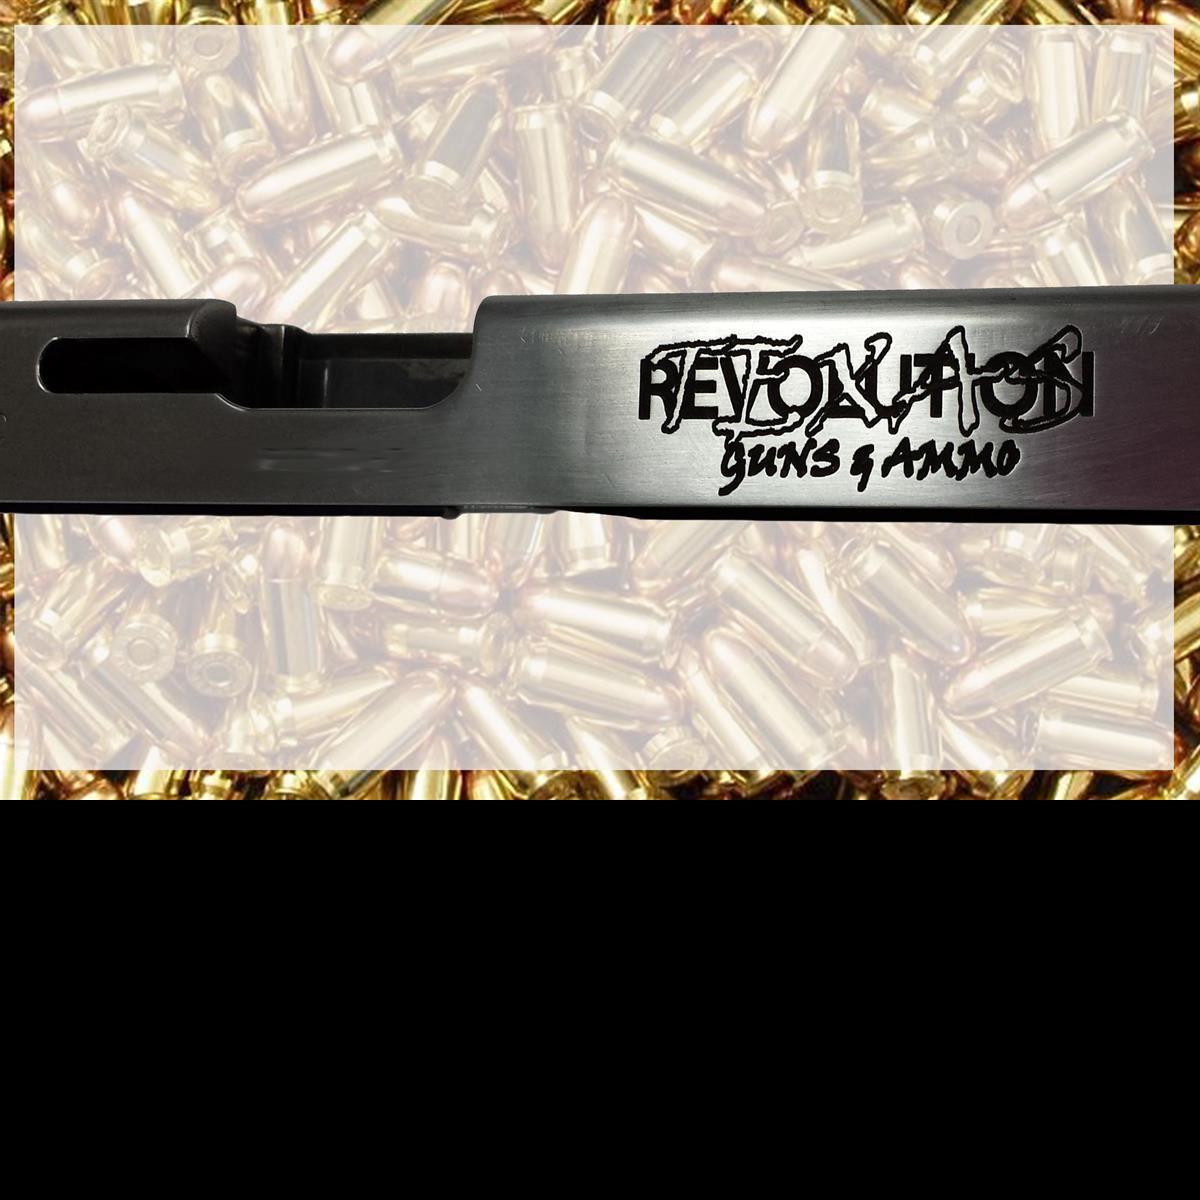 Gun Slide engraving company logo